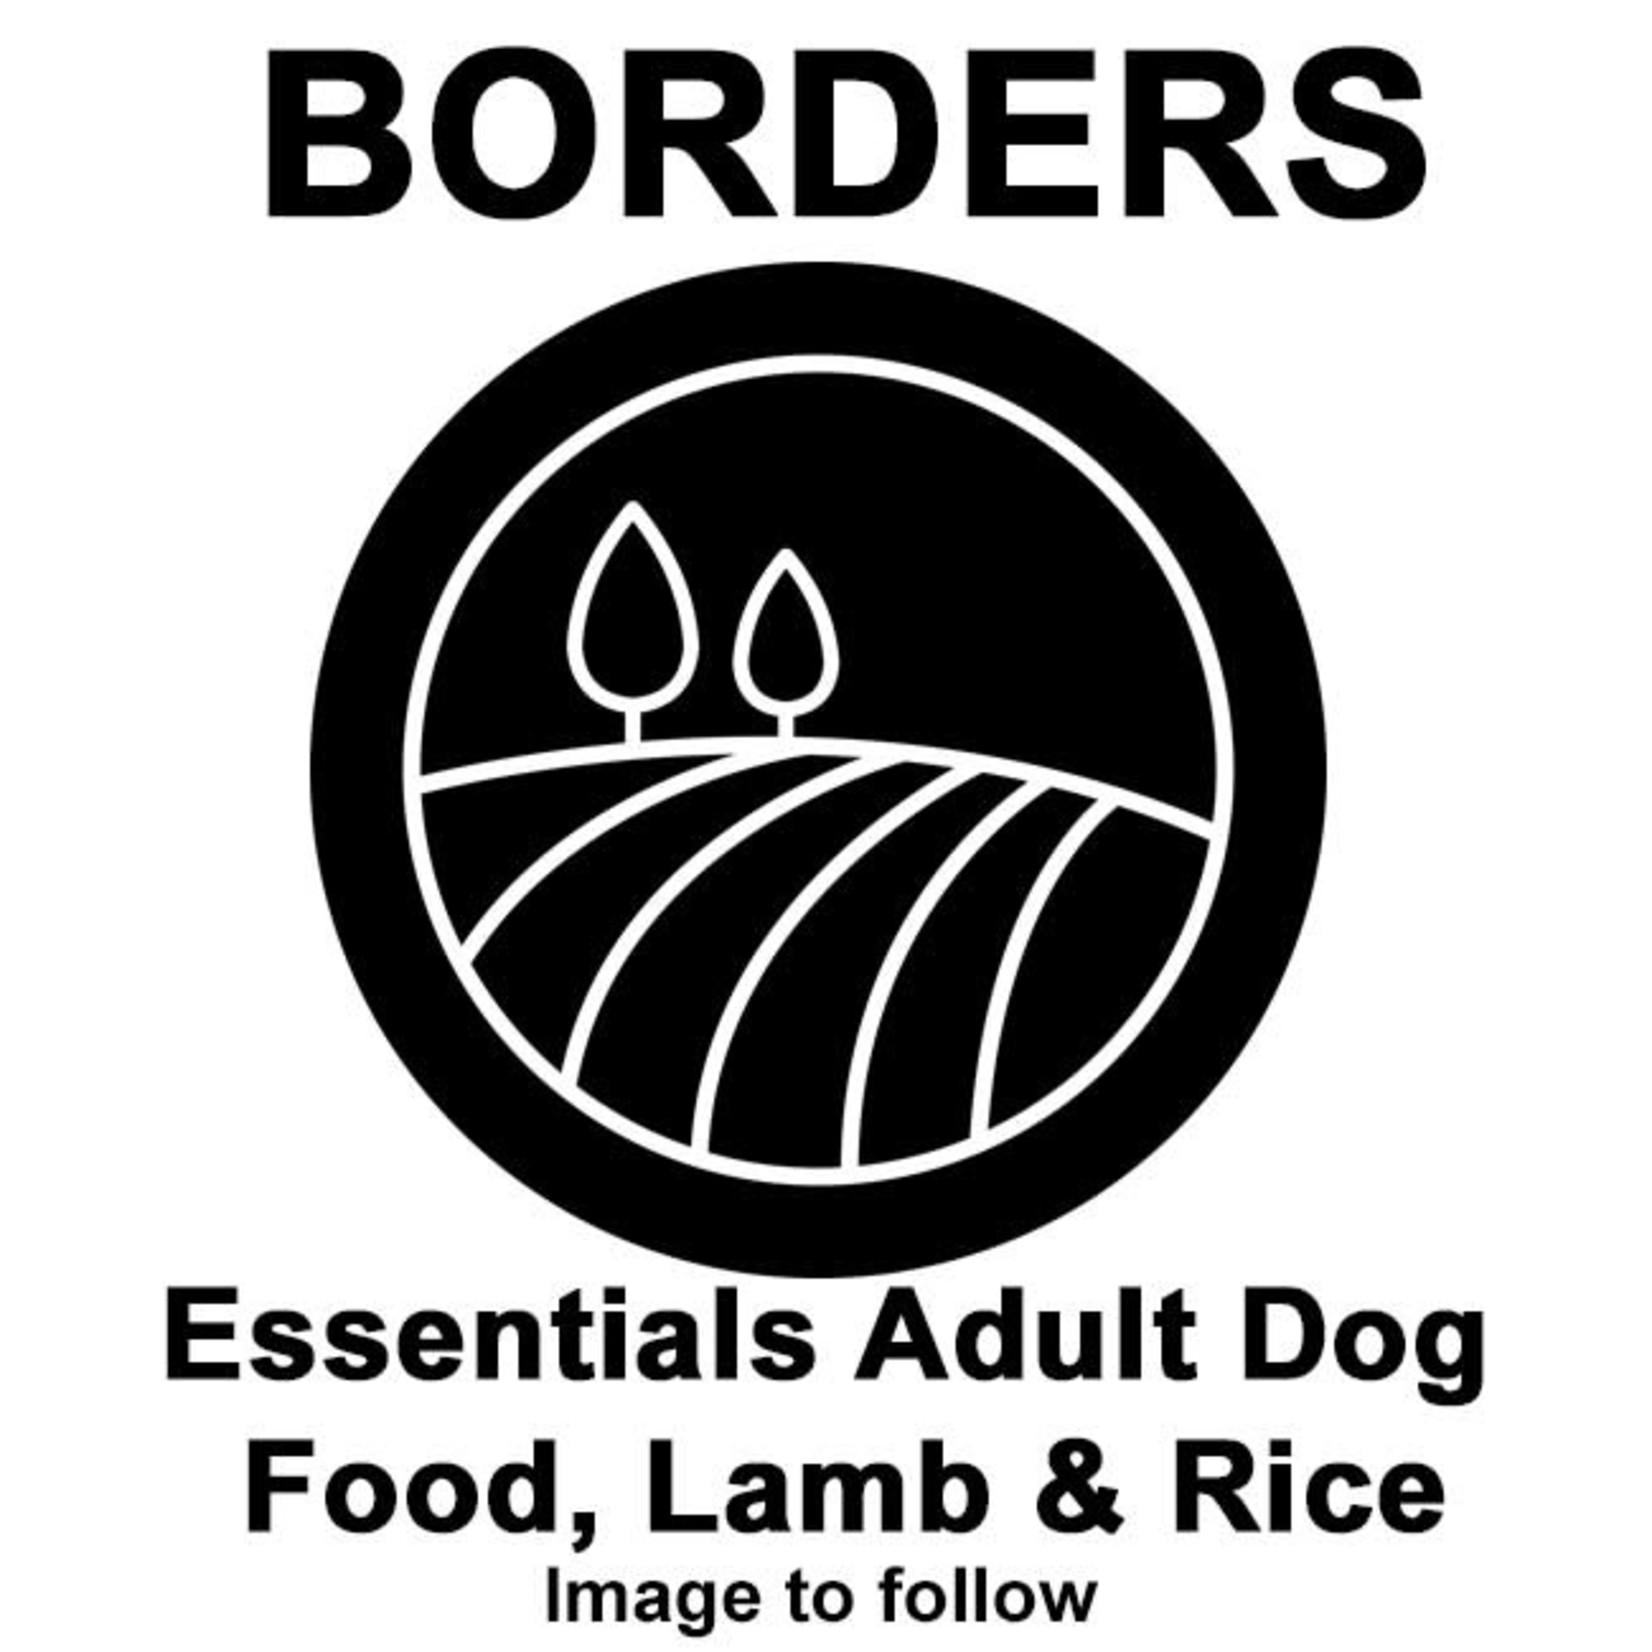 Borders Essentials Adult Dog Food, Lamb & Rice 15kg